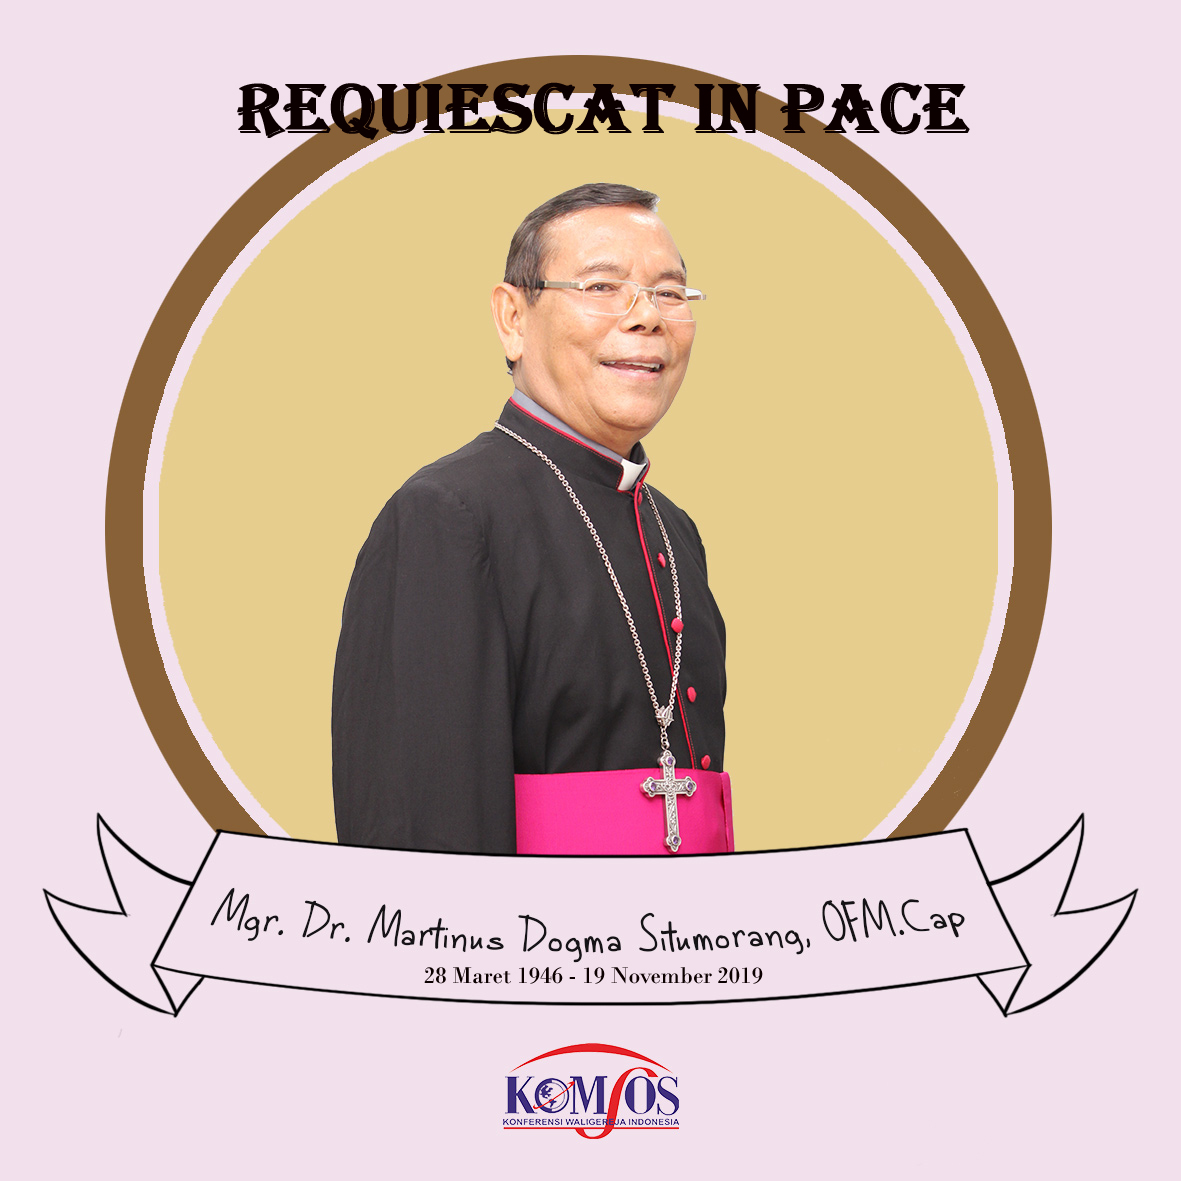 #KomsosKWI, Konferensi Waligereja Indonesia, Mgr Situmorang, Mgr. Martinus Dogma Situmorang OFMCap, Uskup Keuskupan Padang